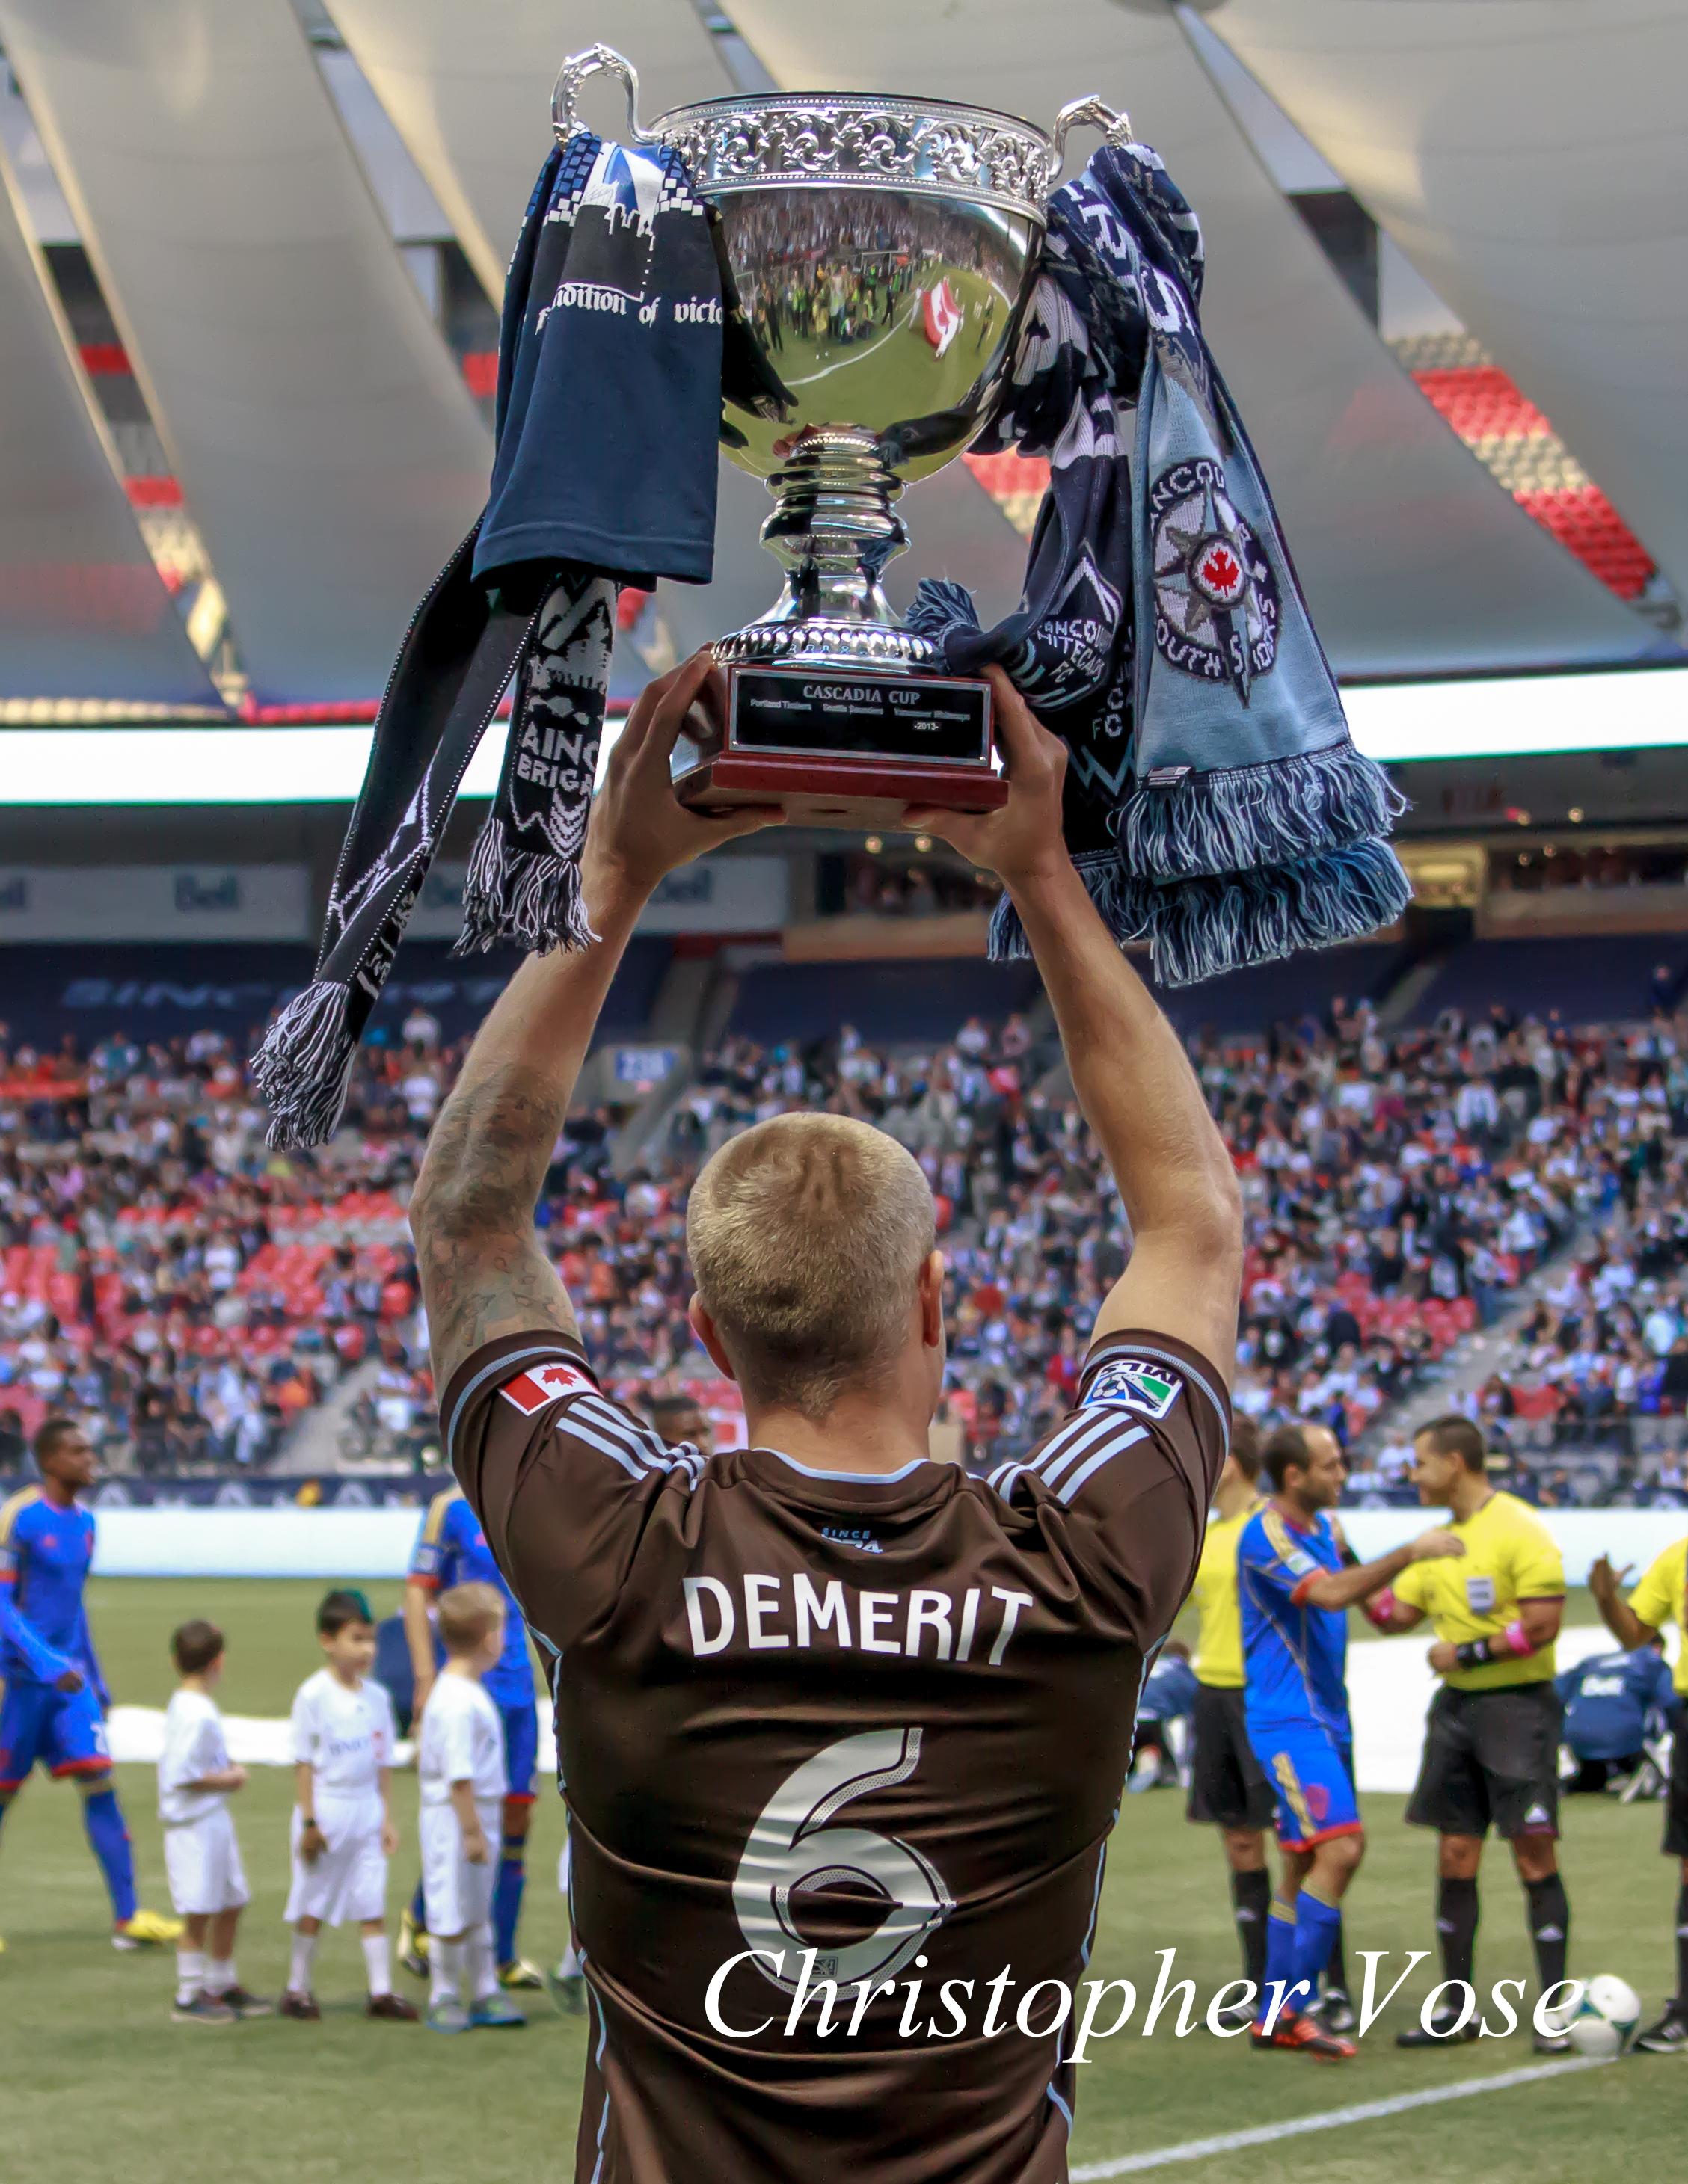 2013-10-27 Cascadia Cup and Jay DeMerit.jpg